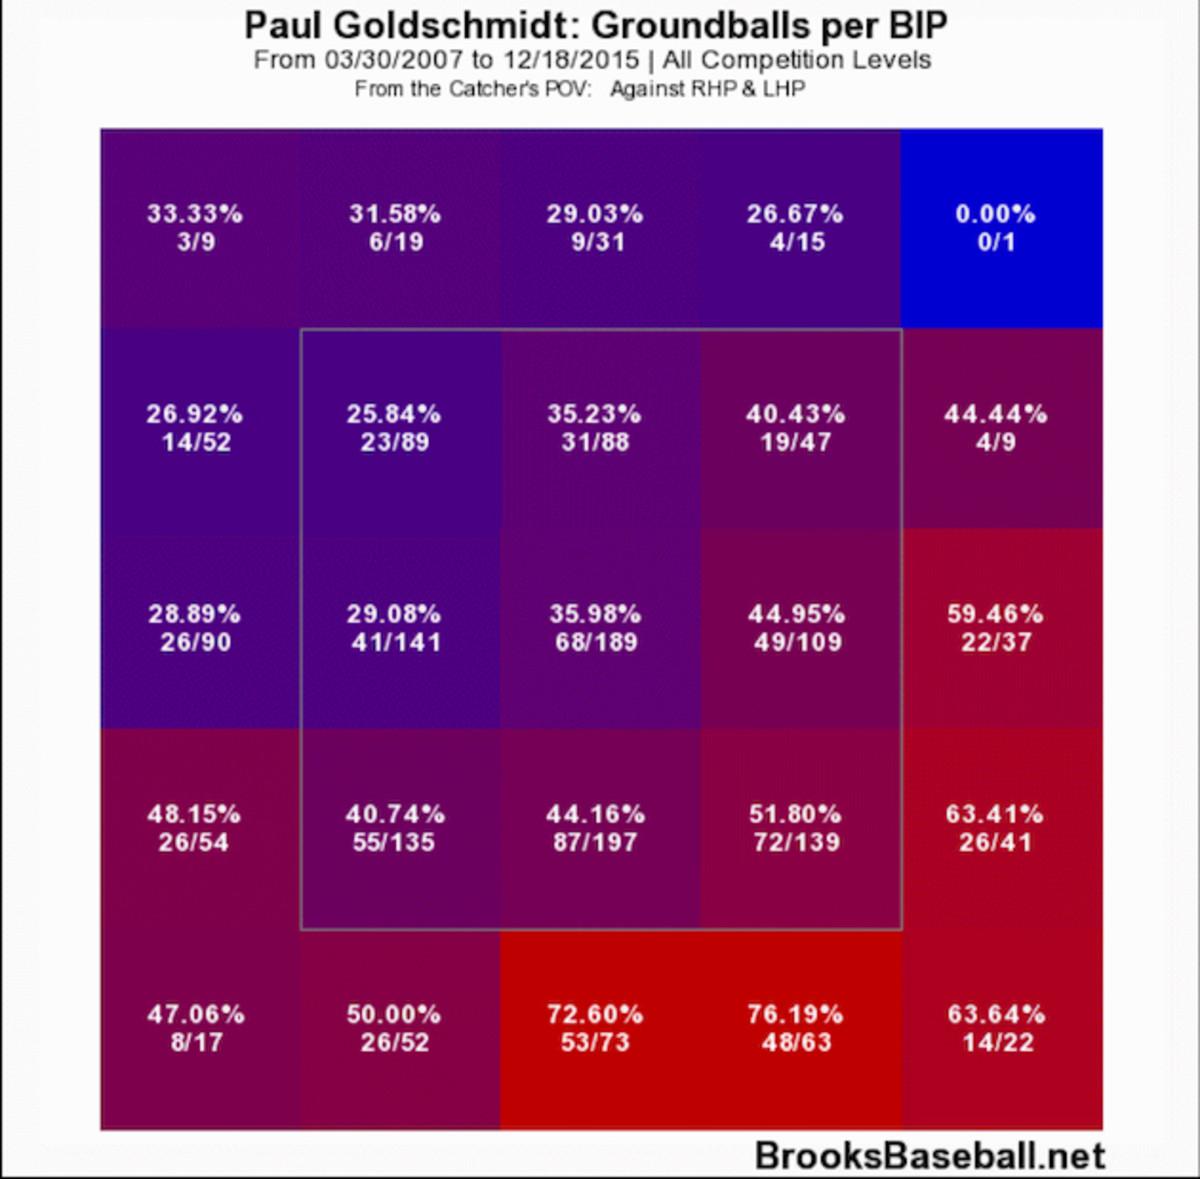 paul-goldschmidt-1.jpg